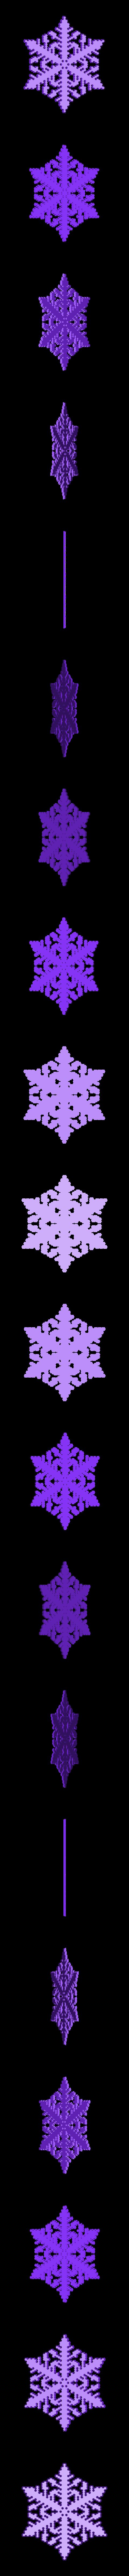 reiter40-var0.stl Download free STL file Snowflake growth simulation in BlocksCAD • 3D printing design, arpruss